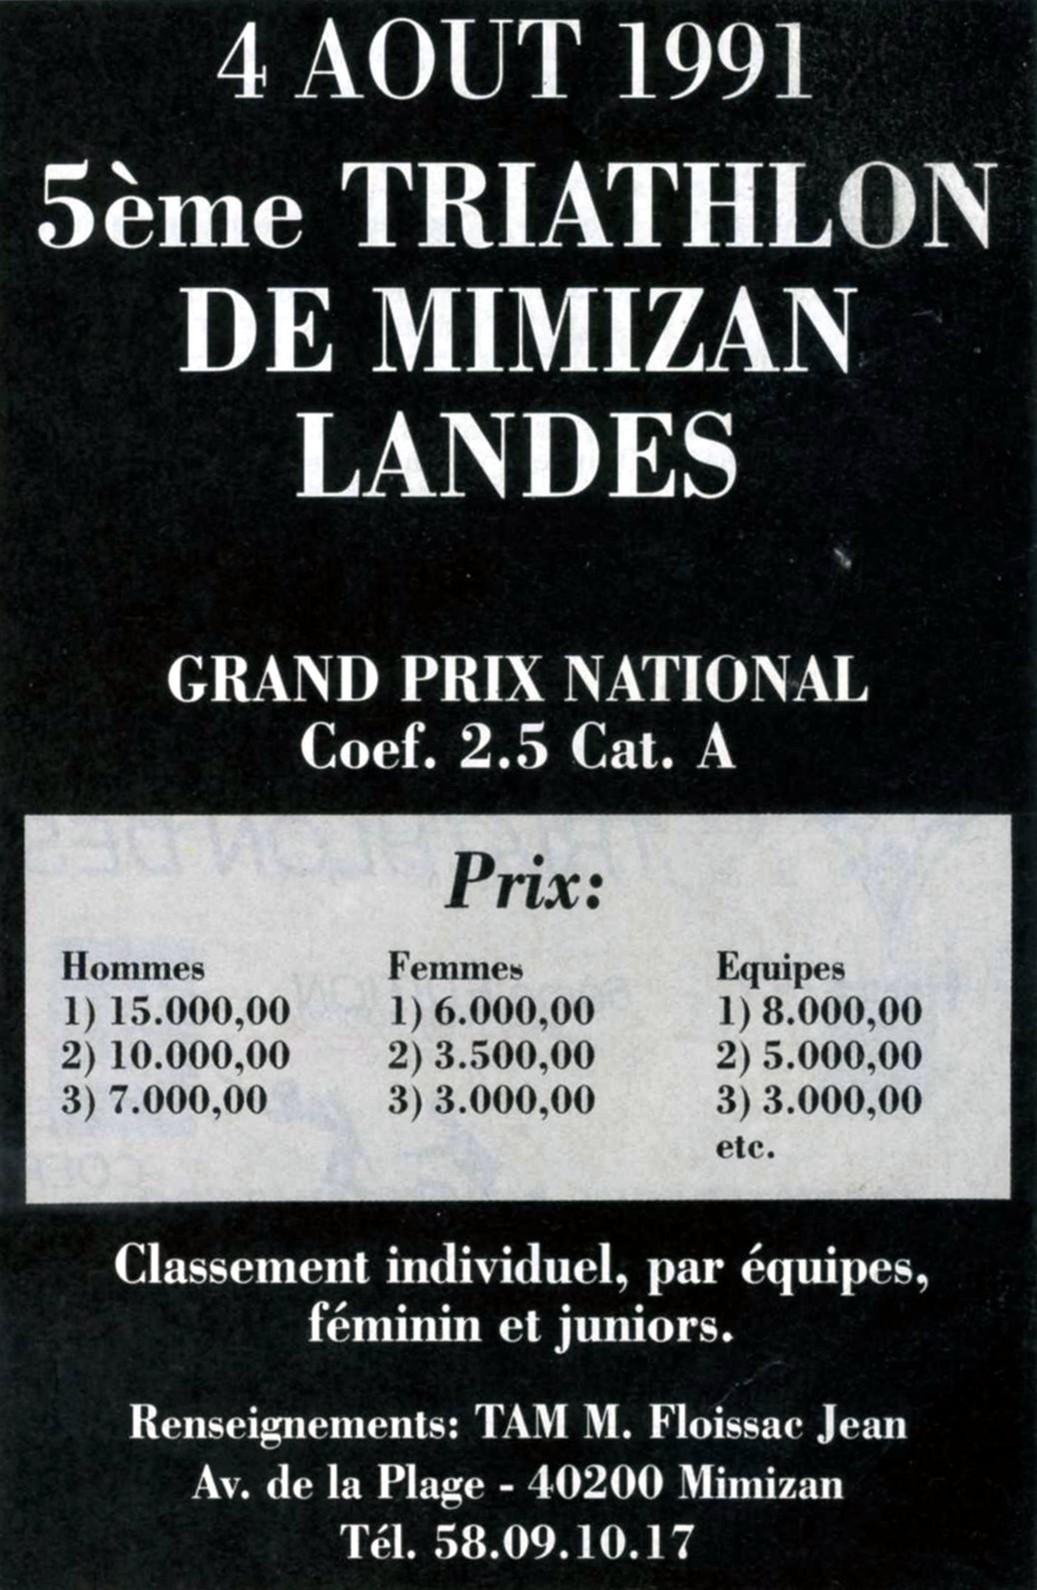 img[A]200_04-aout-1991_mimizan_pub